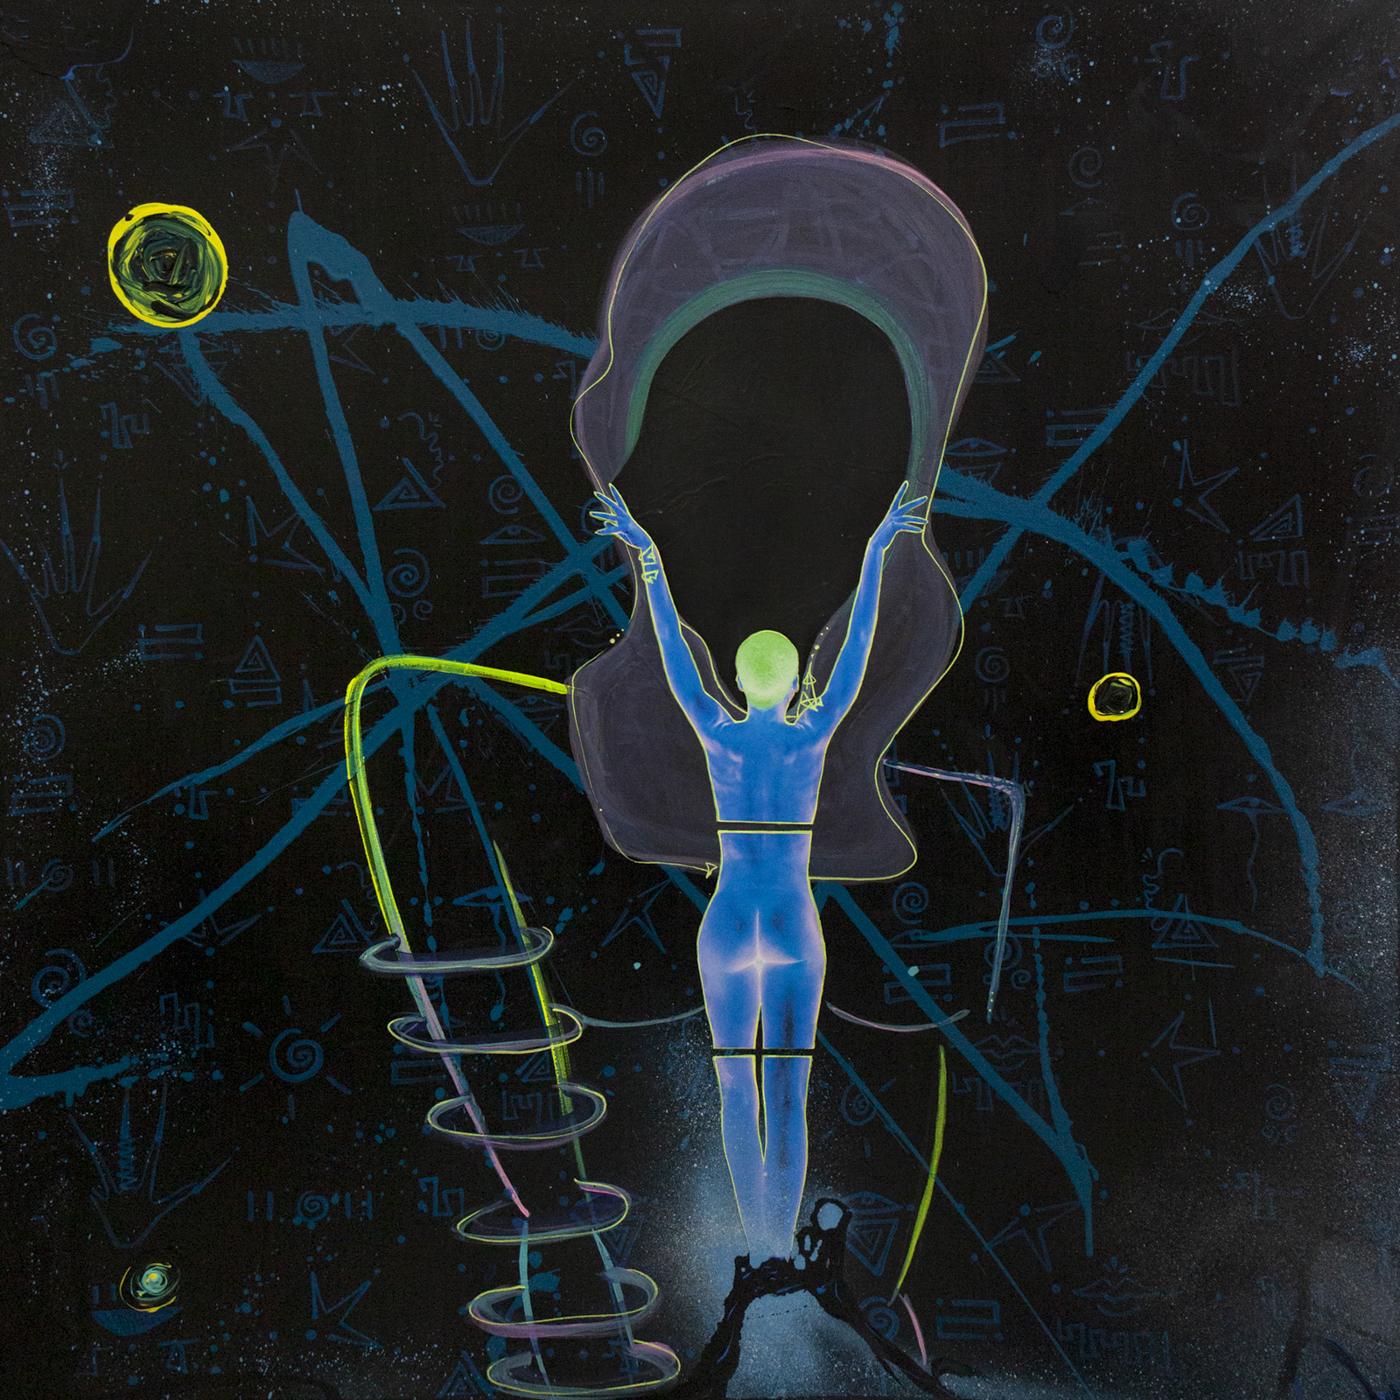 Nichole Washington - Rebellious Black Girl - The Untitled Space, February 2020